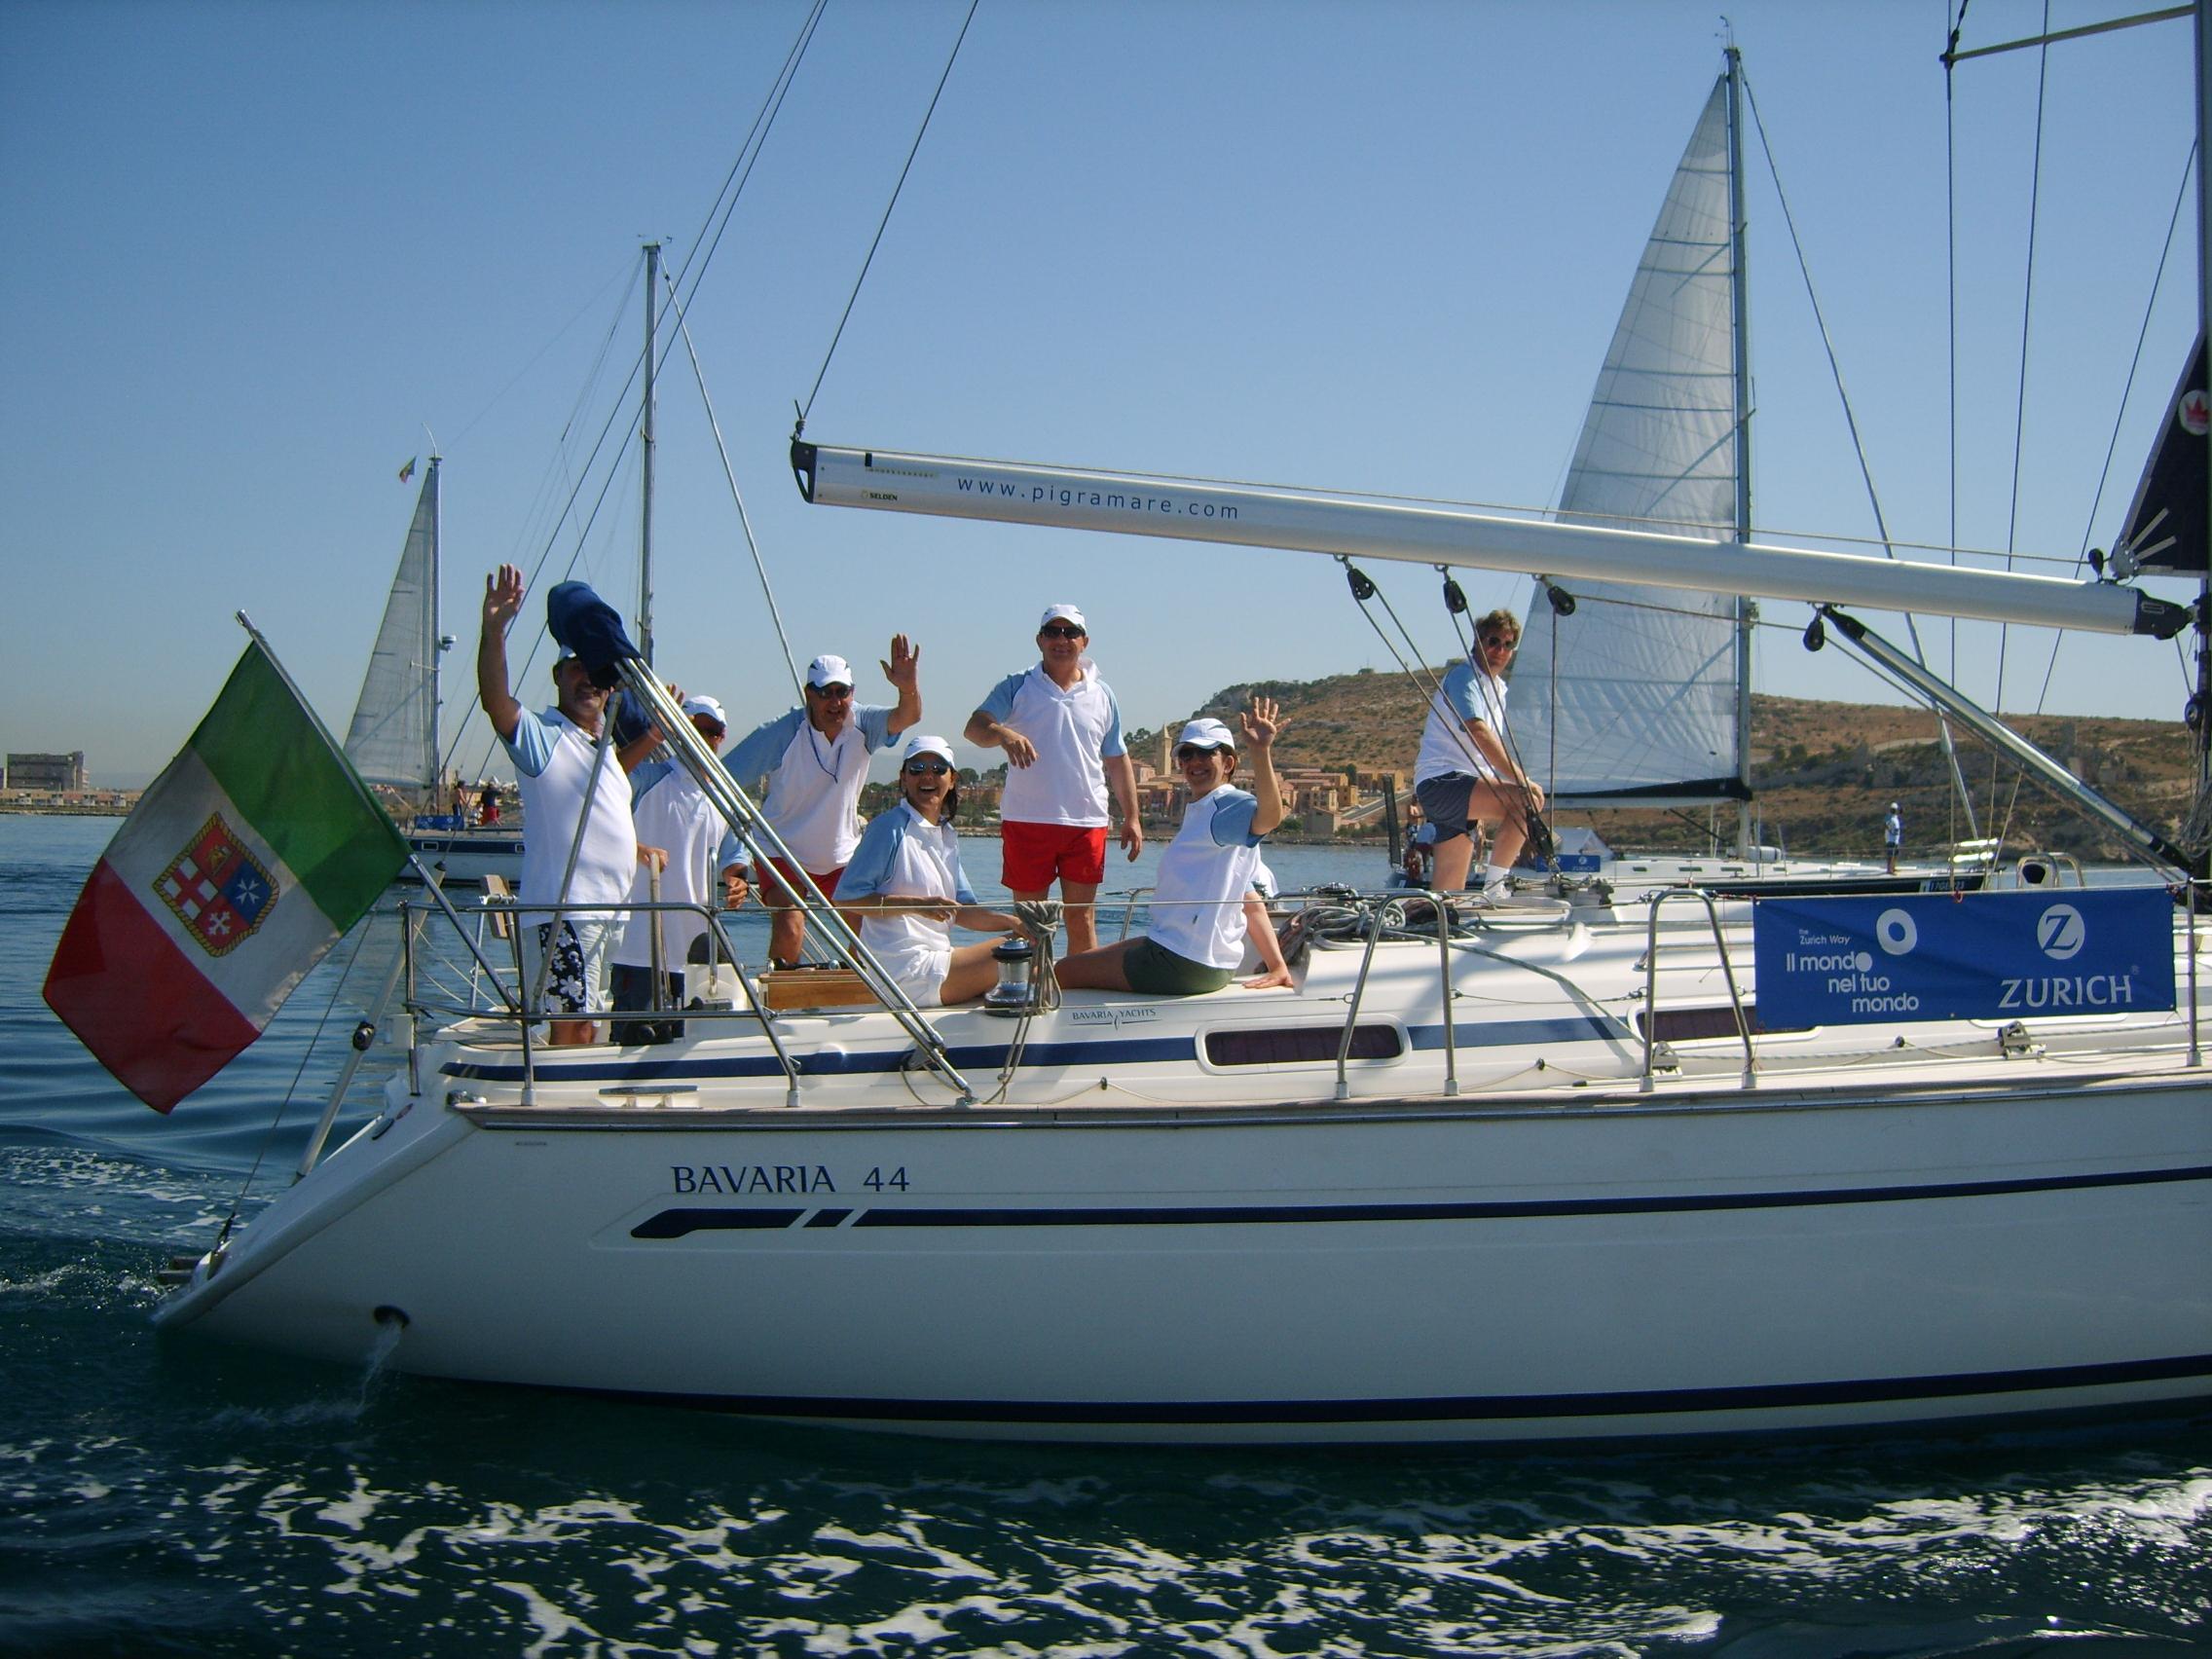 Eventi aziendali in barca a vela